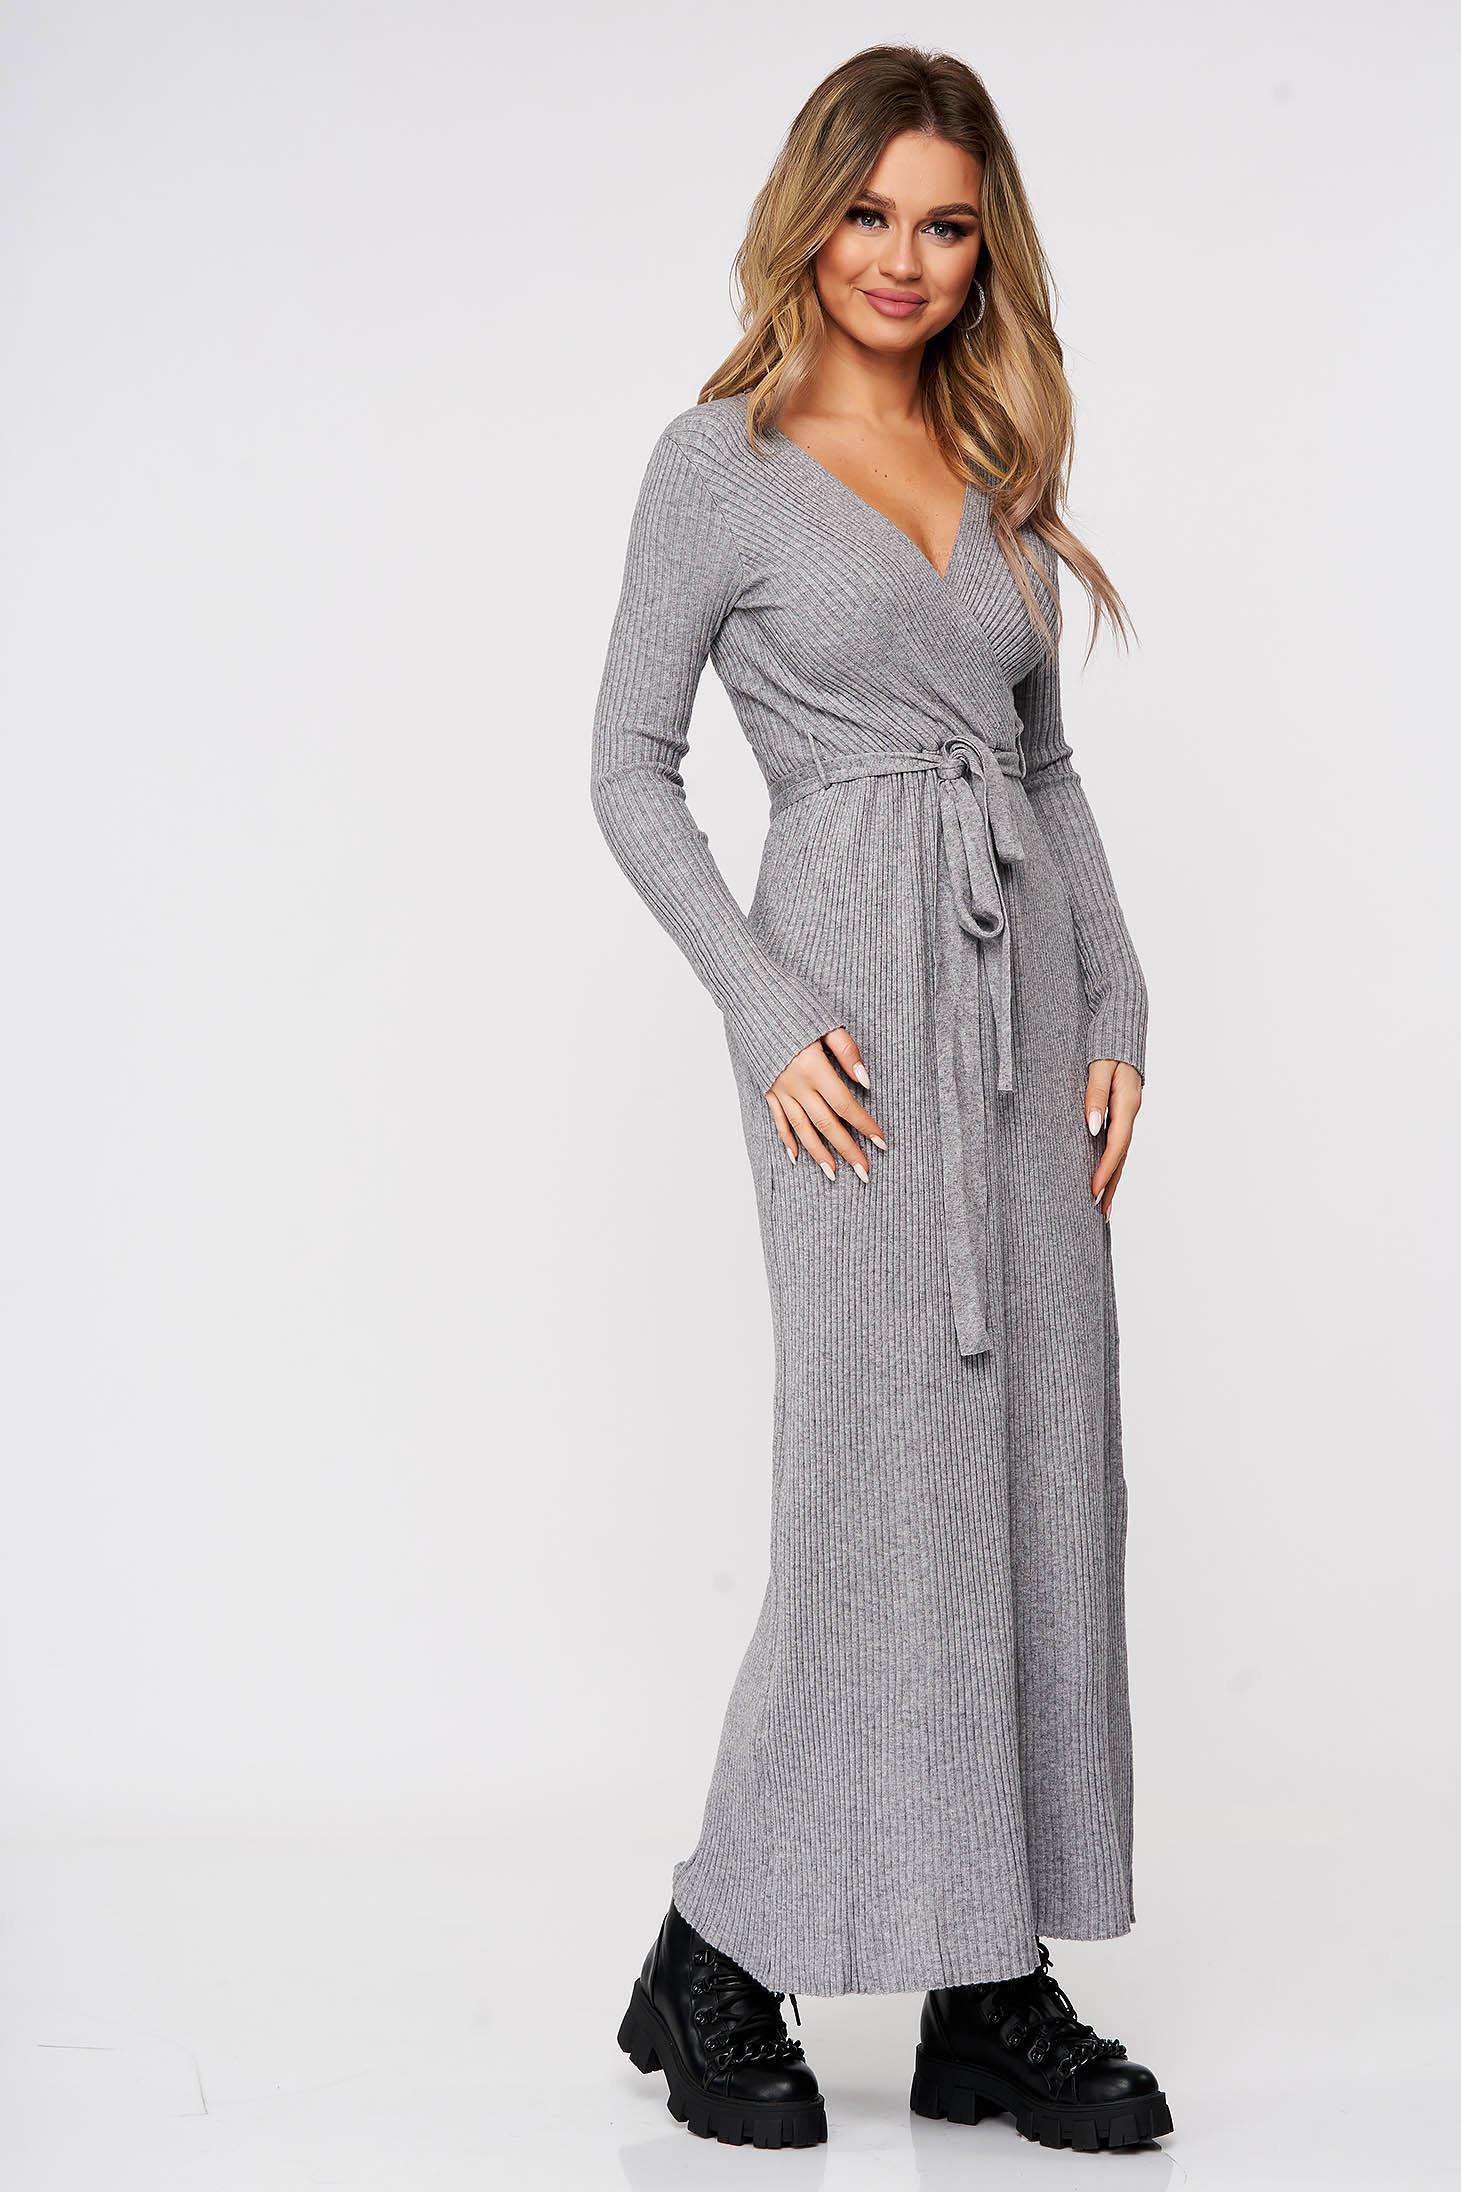 Rochie SunShine casual gri tricotata accesorizata cu cordon din material reiat elastic si fin